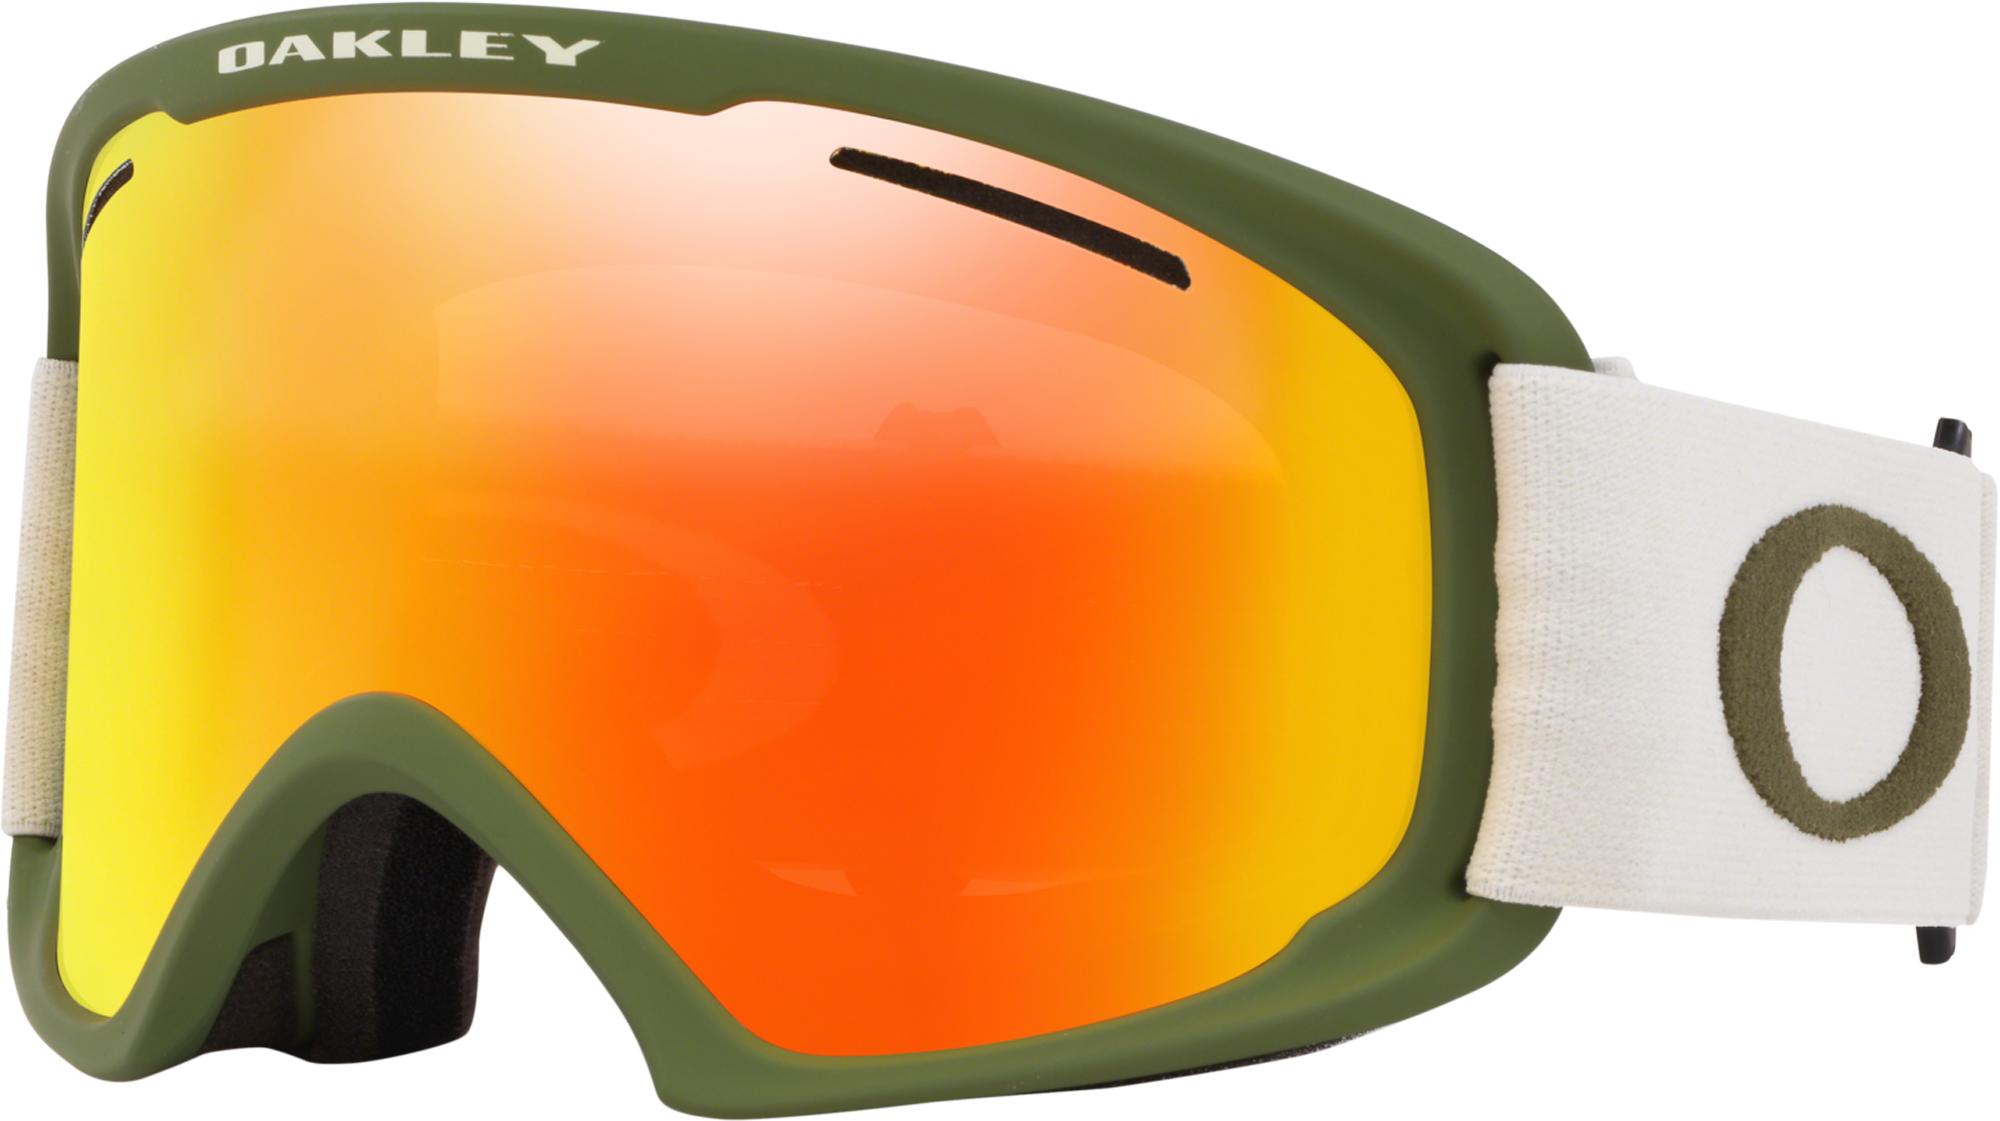 Oakley Маска со сменной линзой OakleyO FRAME 2.0 PRO